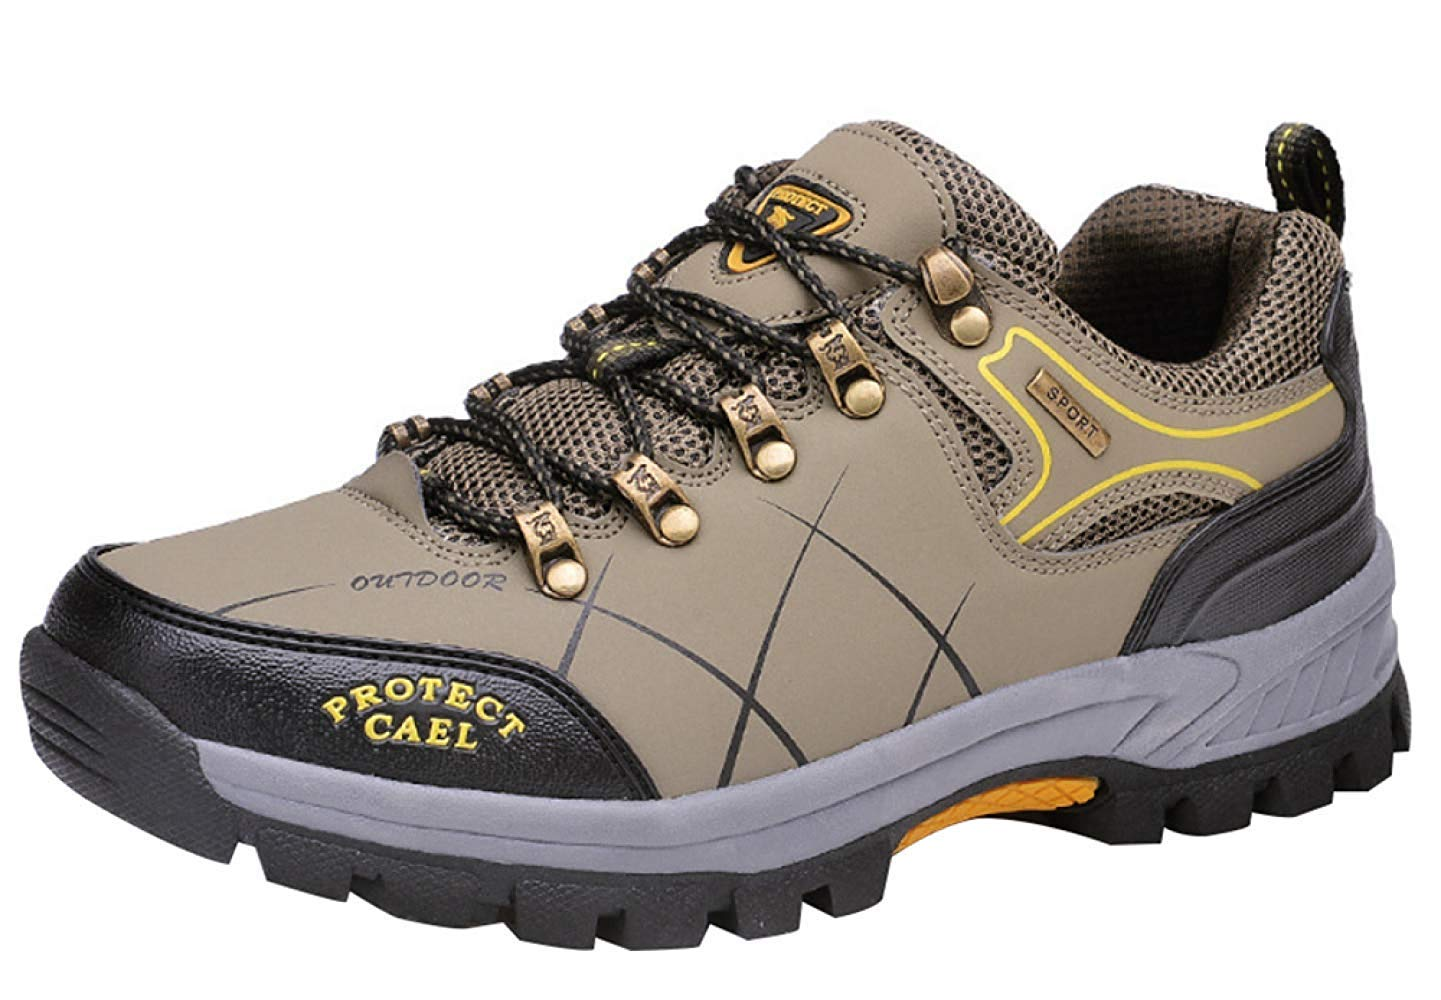 Männer Wanderschuhe Stiefel Leder Wanderschuhe Turnschuhe Für Outdoor Trekking Training Beiläufige Arbeit (Farbe : 9, Größe : 42EU)